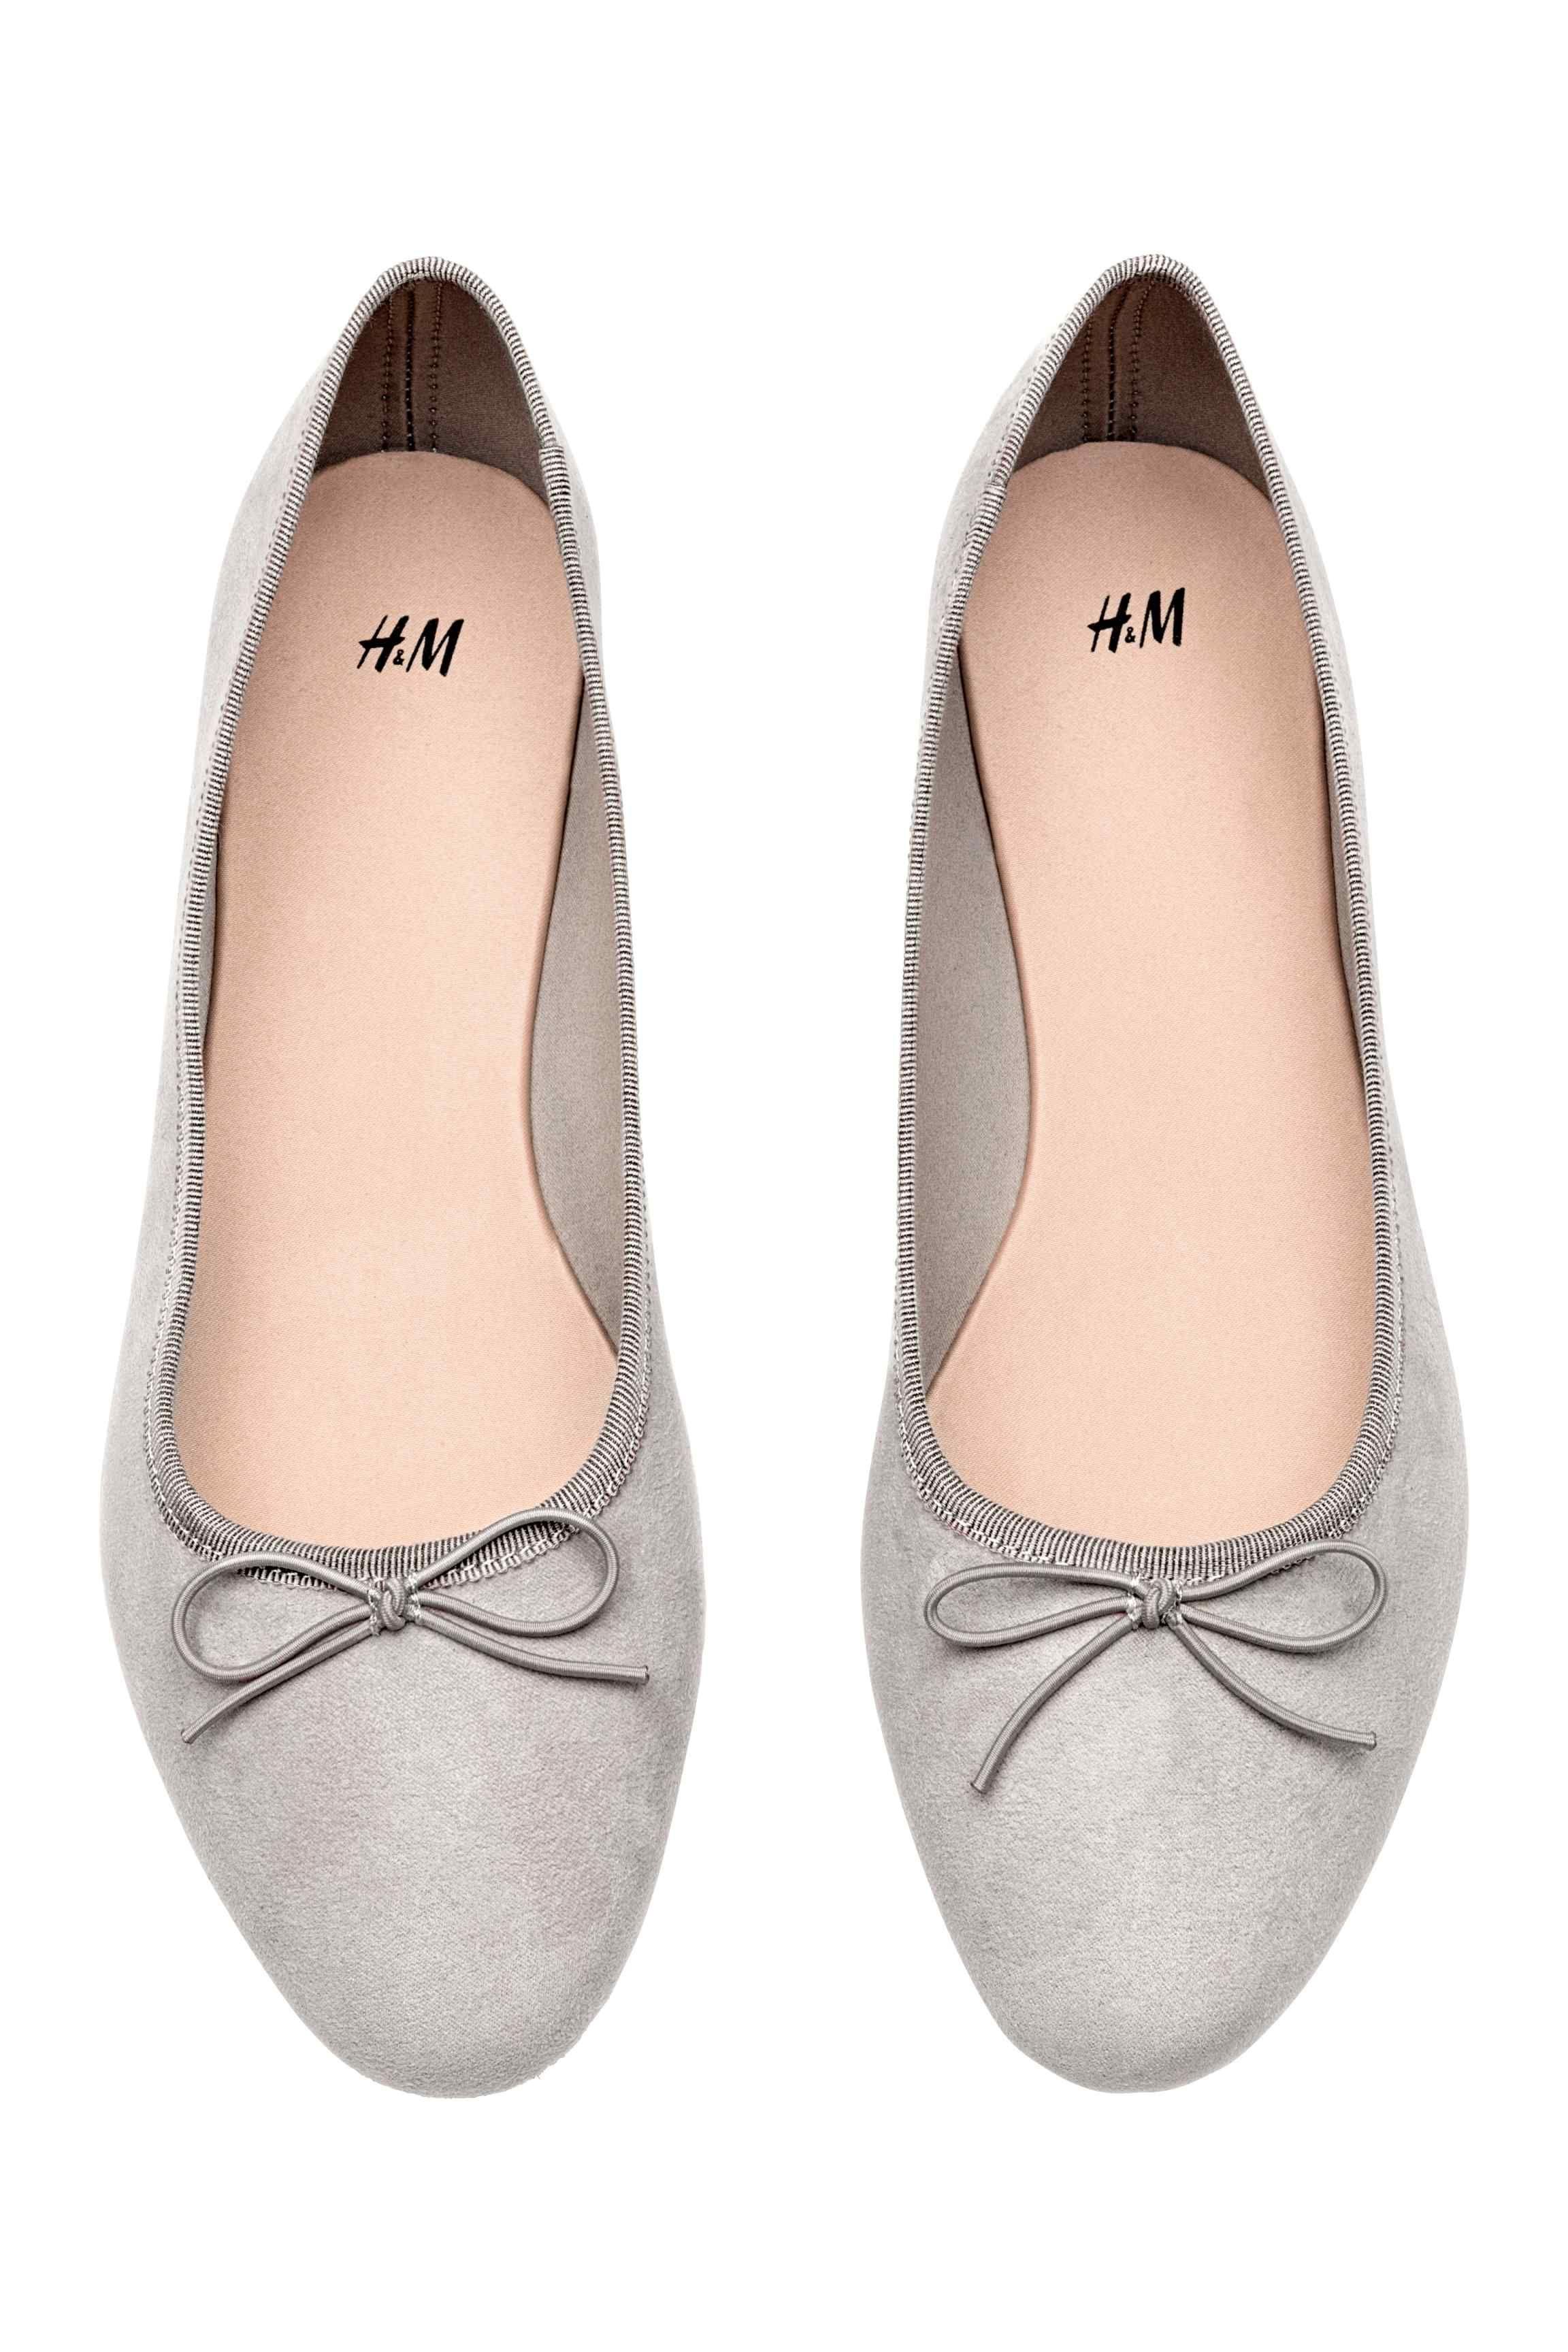 Journee Collection Womens Lena Light Grey Ballet Flats